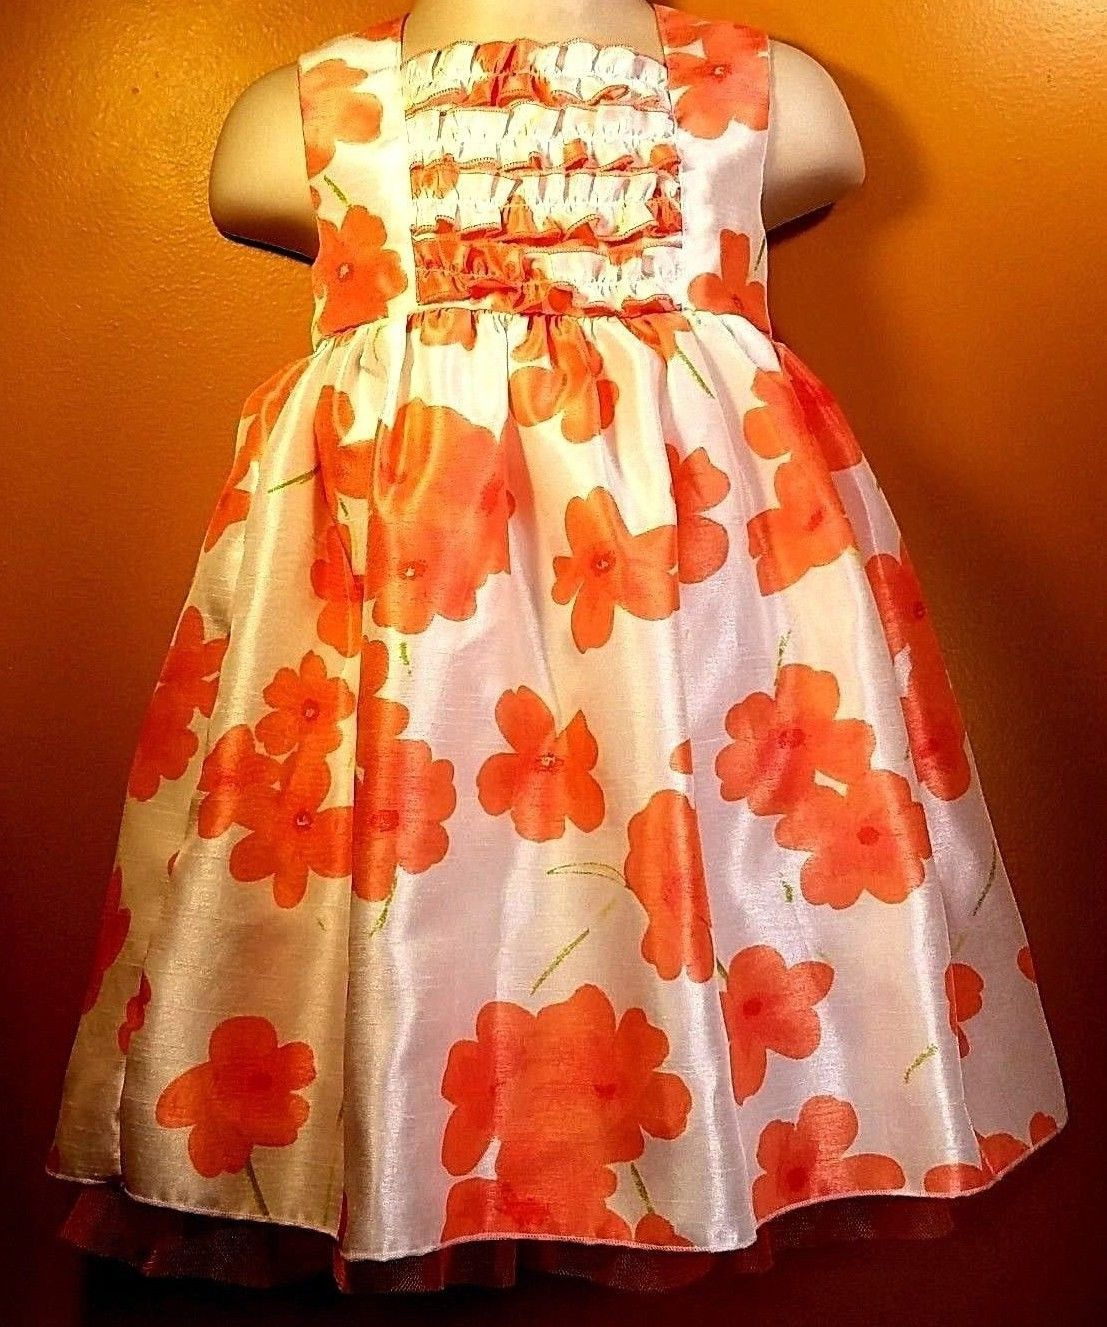 Youngland Toddler Girls Sz 3t Coral Orange Floral Satin Tulle Tutu Summer Dress Ebay Fashion Summer Dresses Satin Tulle [ 1327 x 1107 Pixel ]